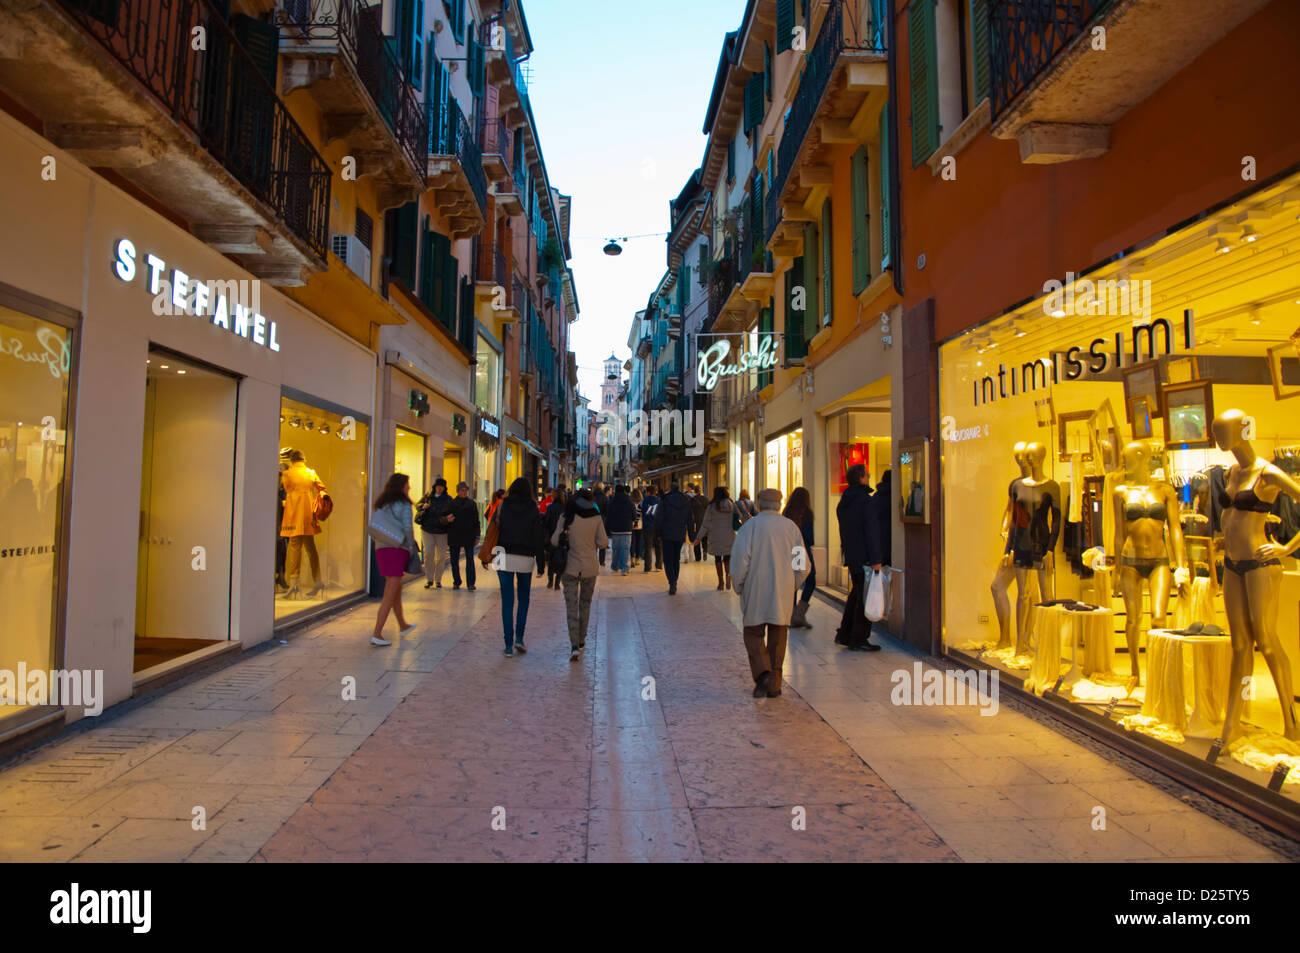 Via Mazzini pedestrian street central Verona city the Veneto region Italy  Europe 9b6720105f1